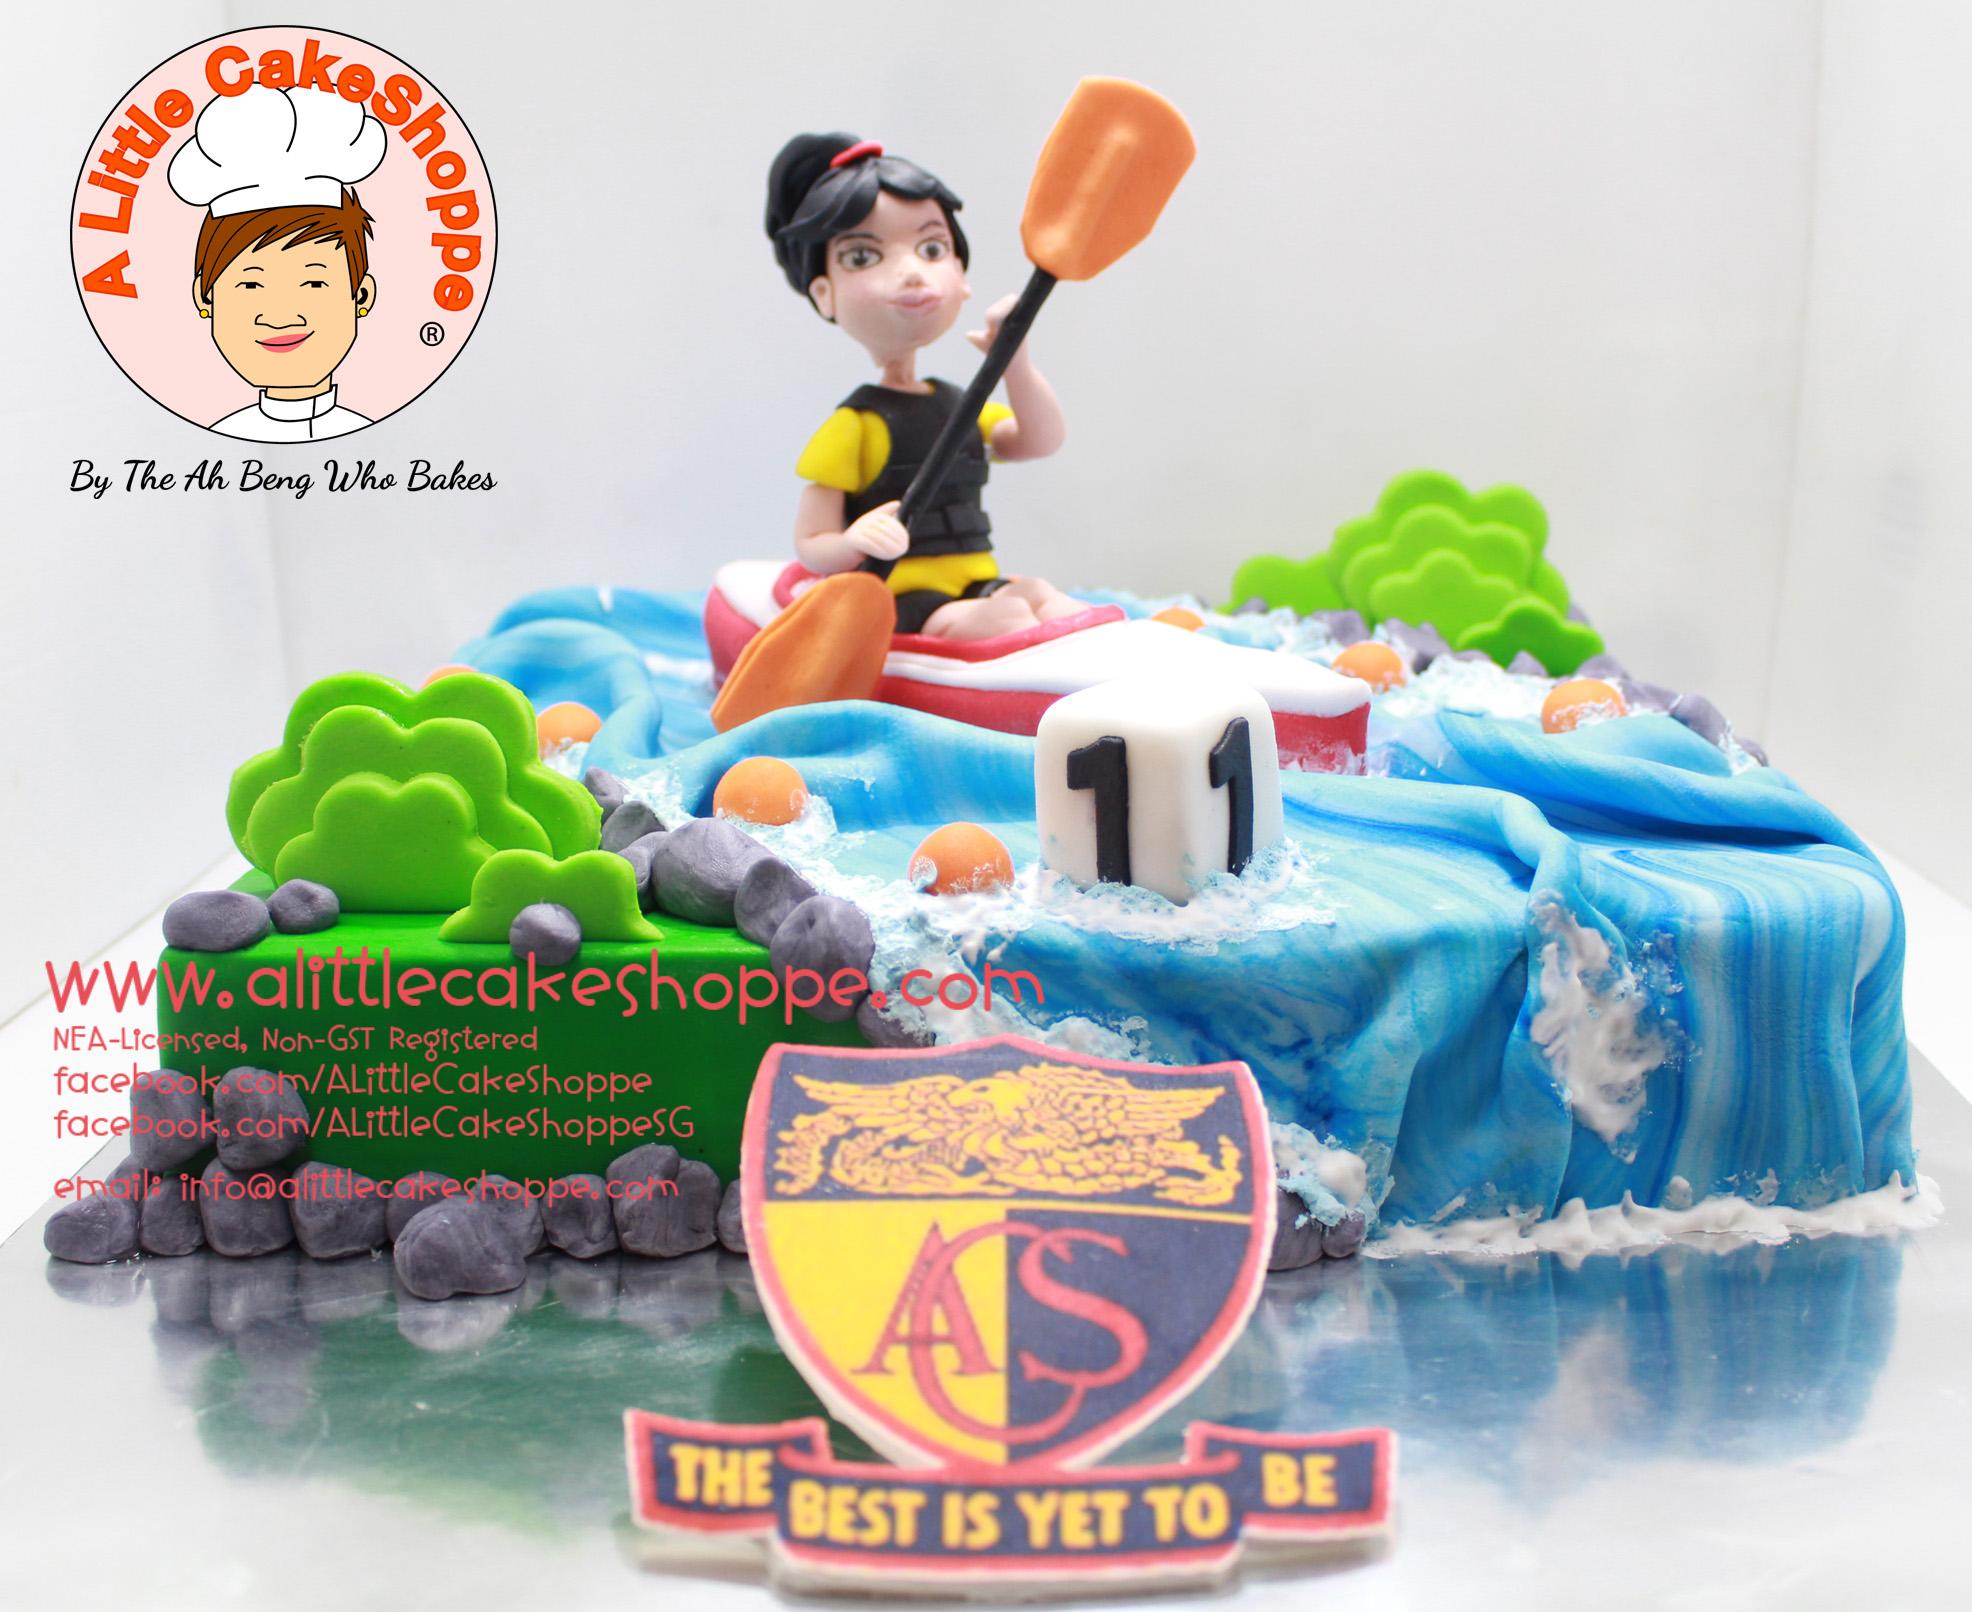 Best Customised Cake Singapore custom cake 2D 3D birthday cake cupcakes desserts wedding corporate events anniversary 1st birthday 21st birthday fondant fresh cream buttercream cakes alittlecakeshoppe a little cake shoppe compliments review singapore bakers SG cakeshop ah beng who bakes acs sports canoe